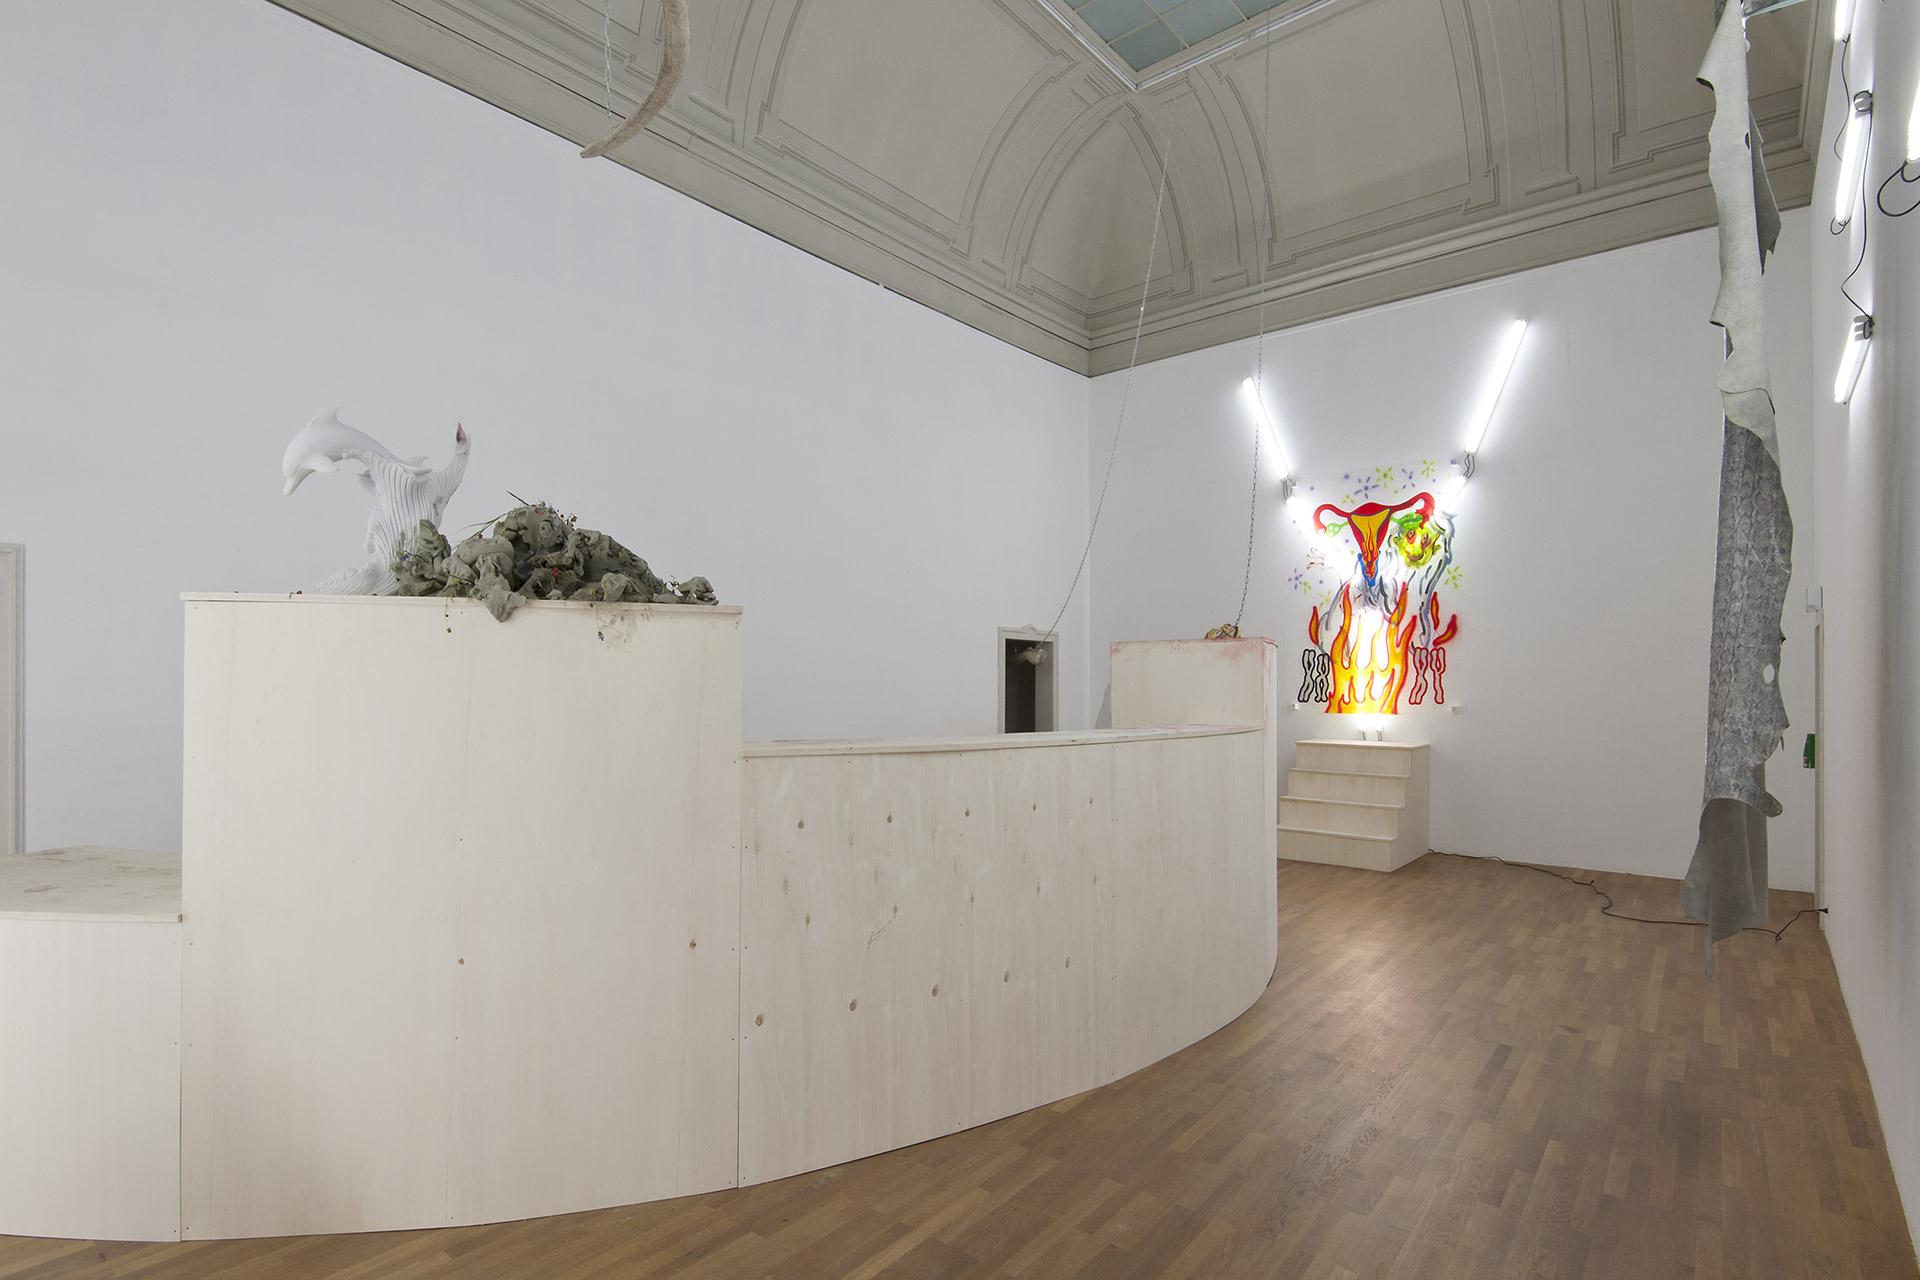 Kunsthalle-Winterthur-Tianzhuo-Chen-2.jpg